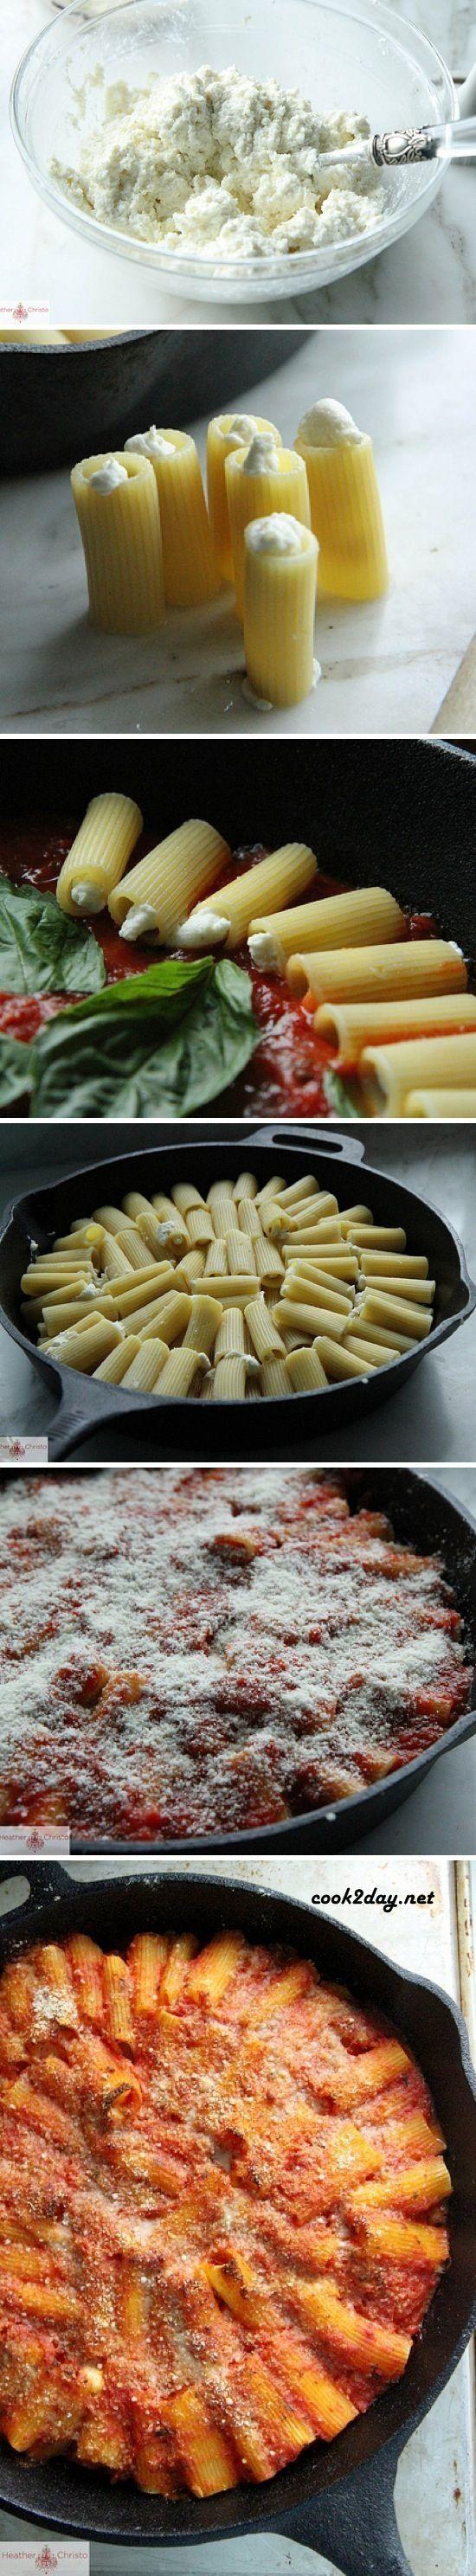 Skillet Baked Stuffed Rigatoni | Amazing Food | Pinterest